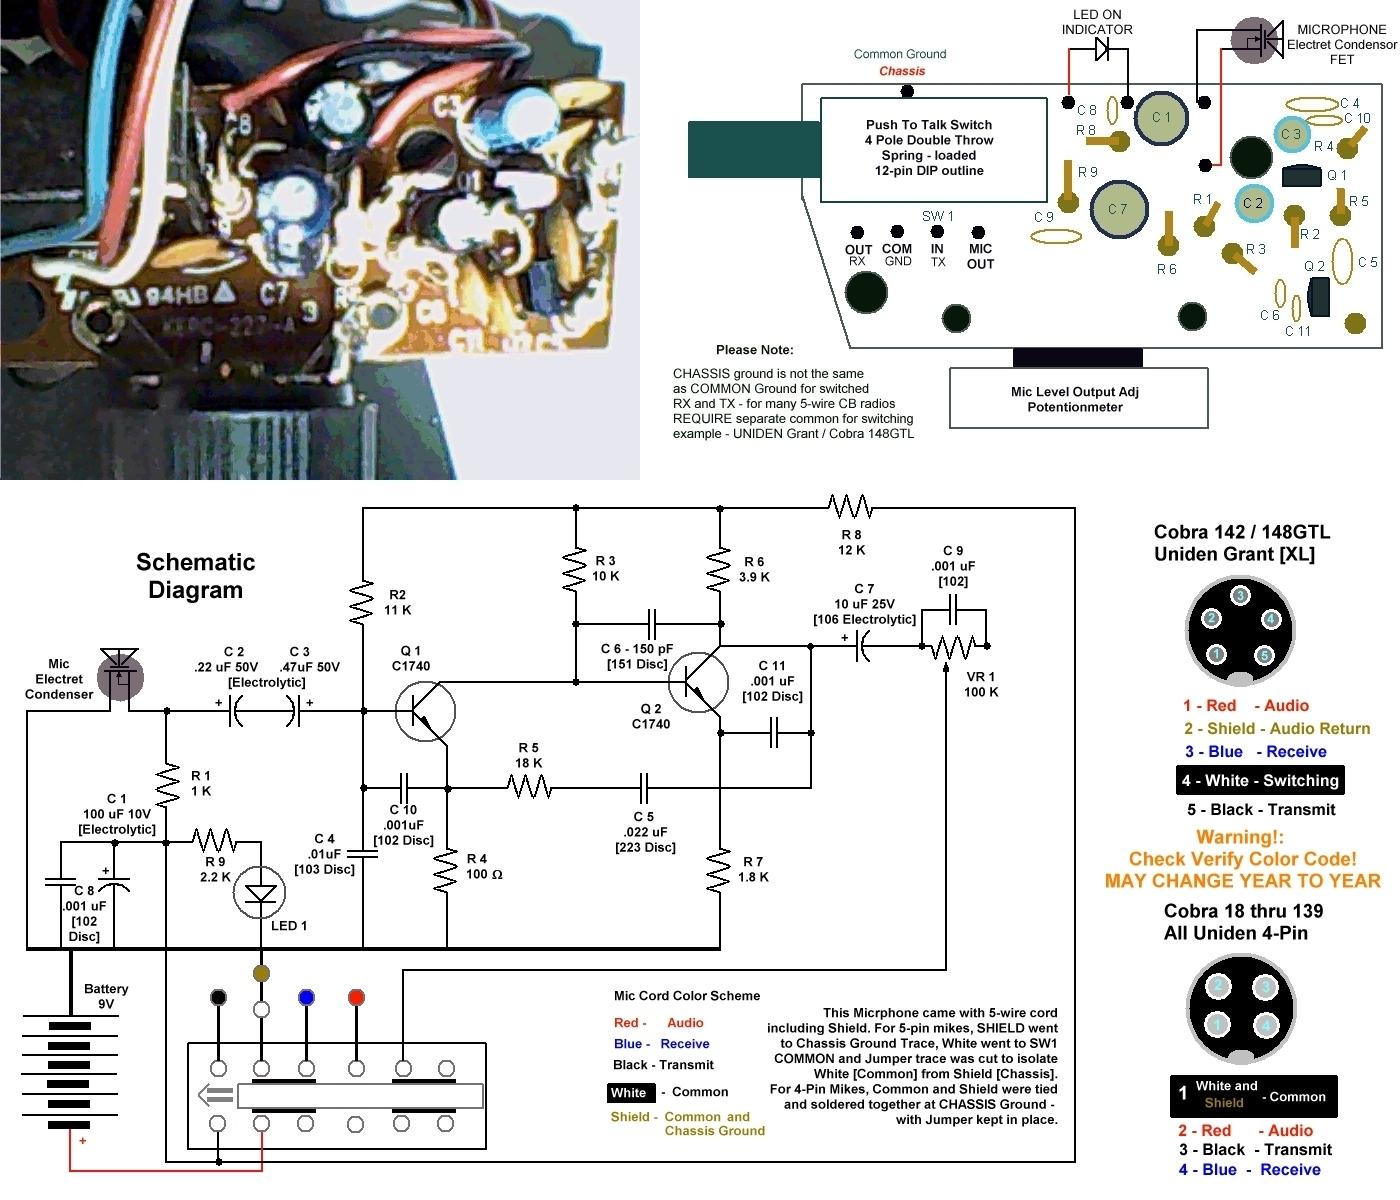 Cb Mic Wiring Diagrams : 22 Wiring Diagram Images - Wiring Diagrams - 4 Pin Cb Mic Wiring Diagram